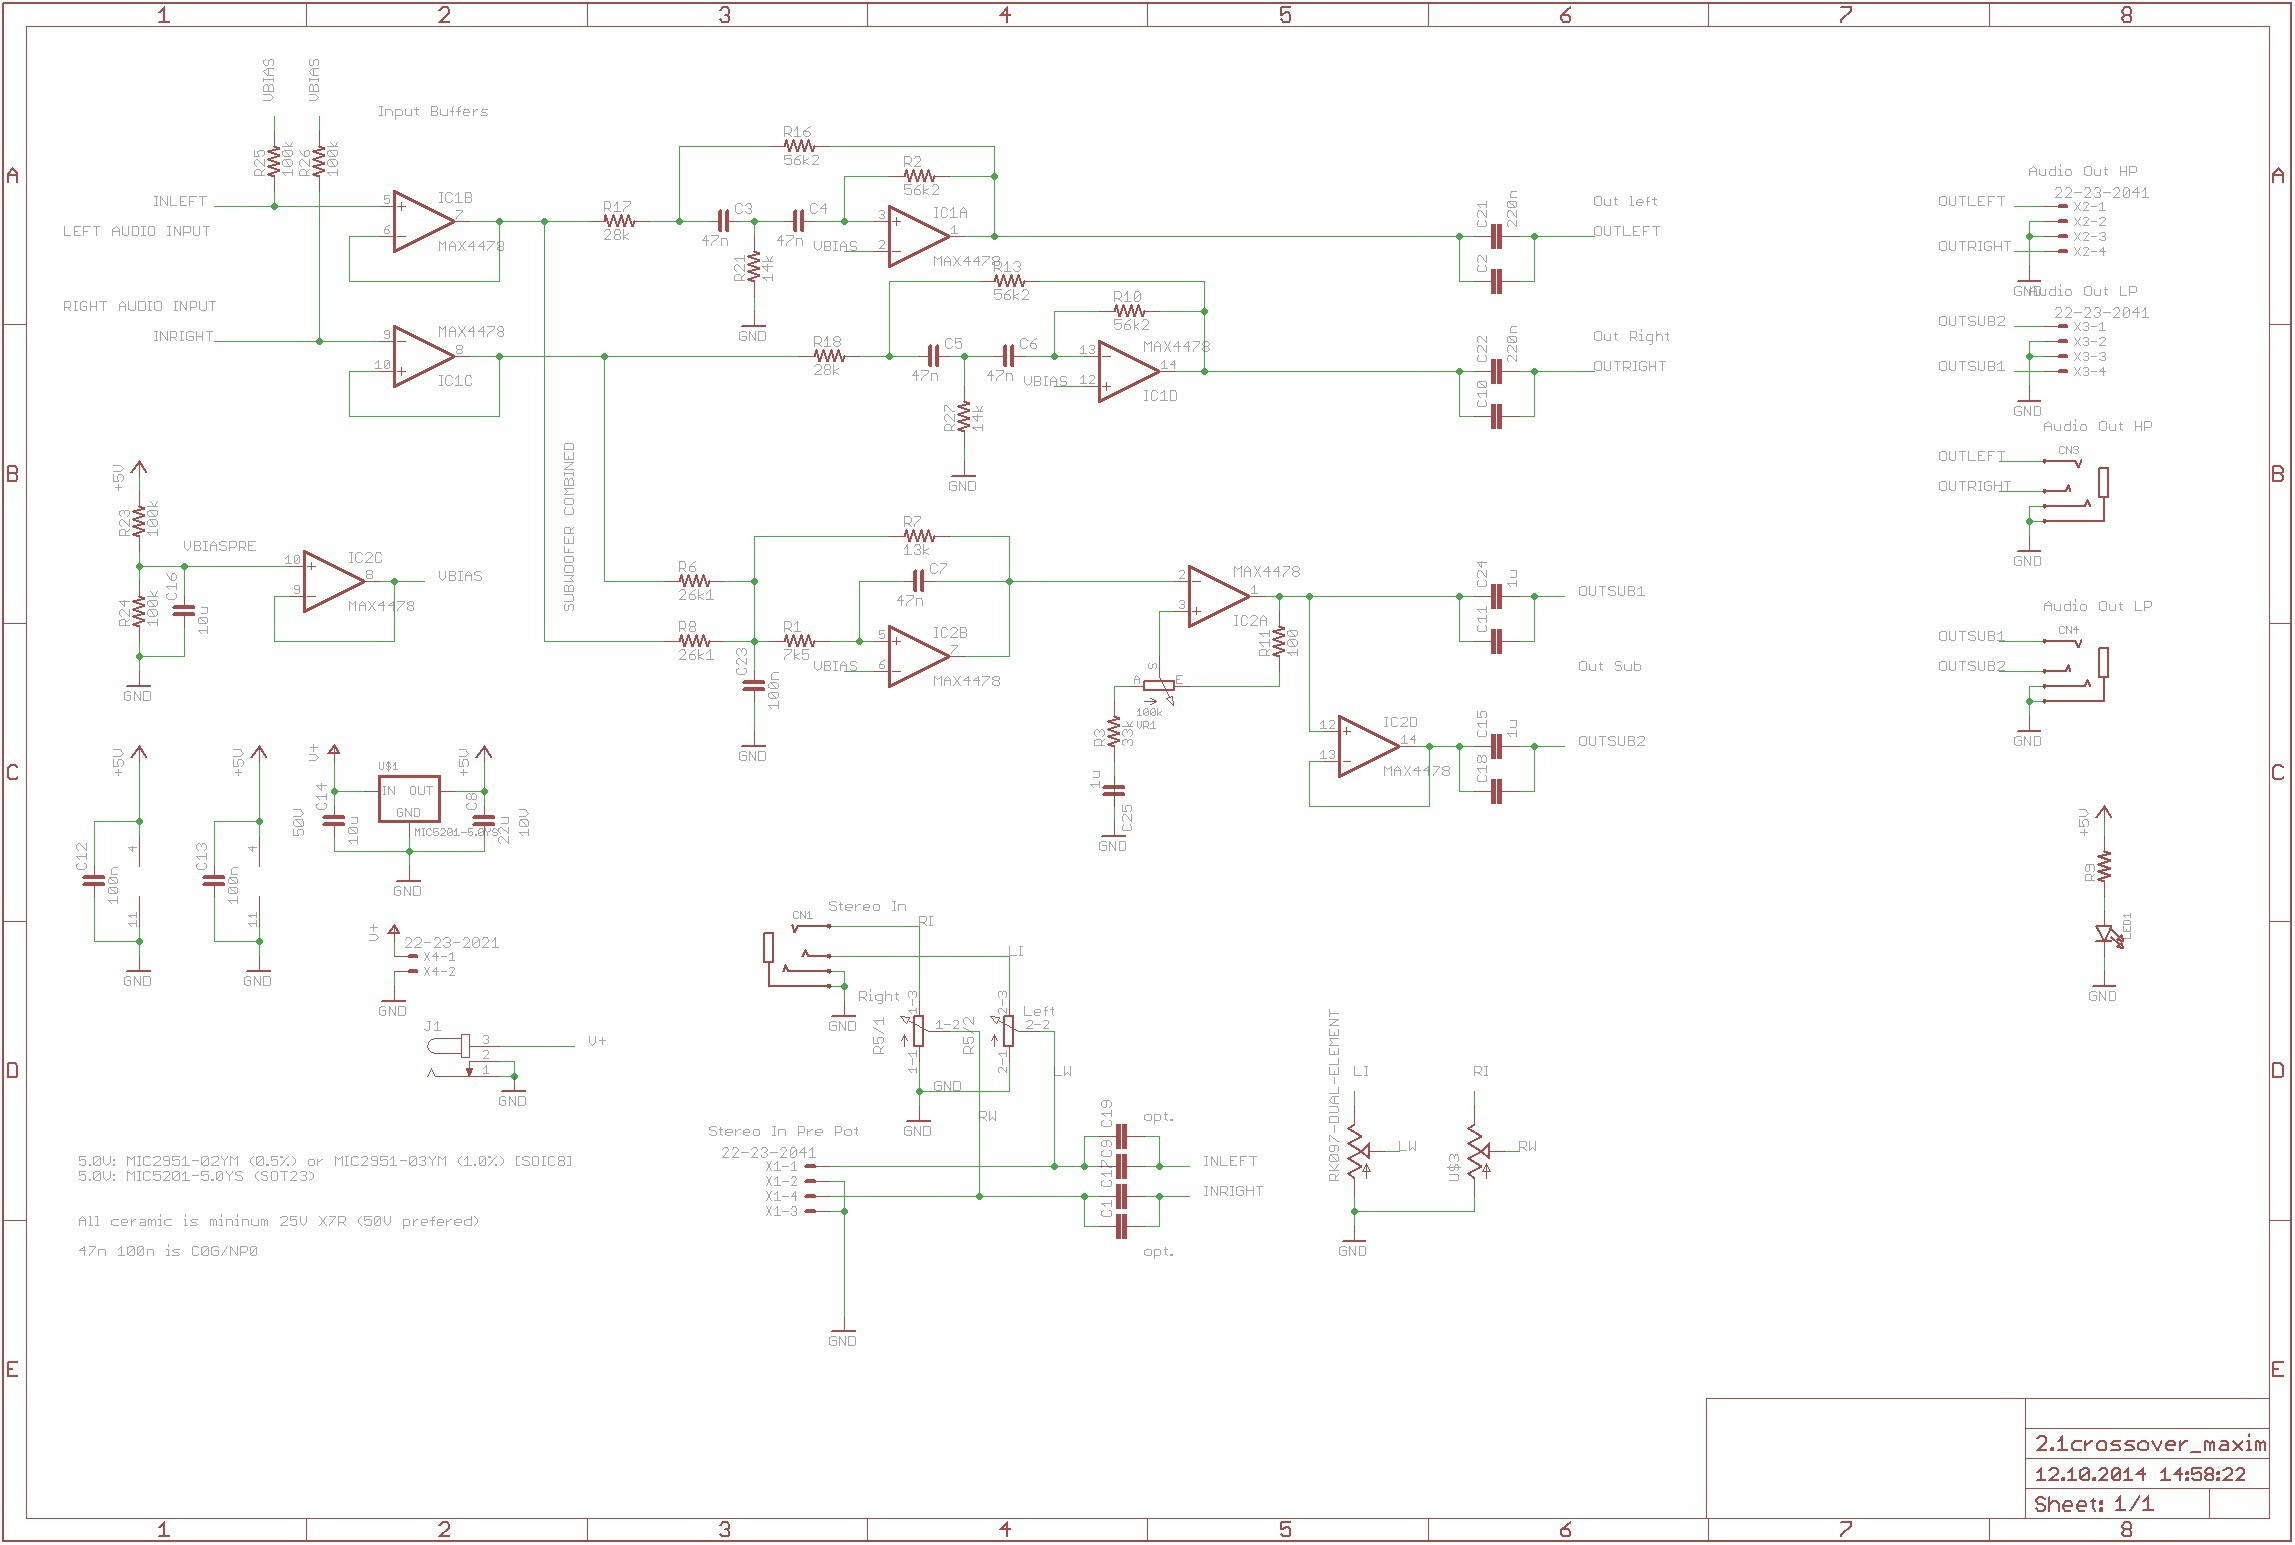 Speaker Crossover Wiring Diagram Aktive Crossoverfrequenzweiche Mit Max4478 360customs Crossover Schematic Rev 0d Wiring Lighting